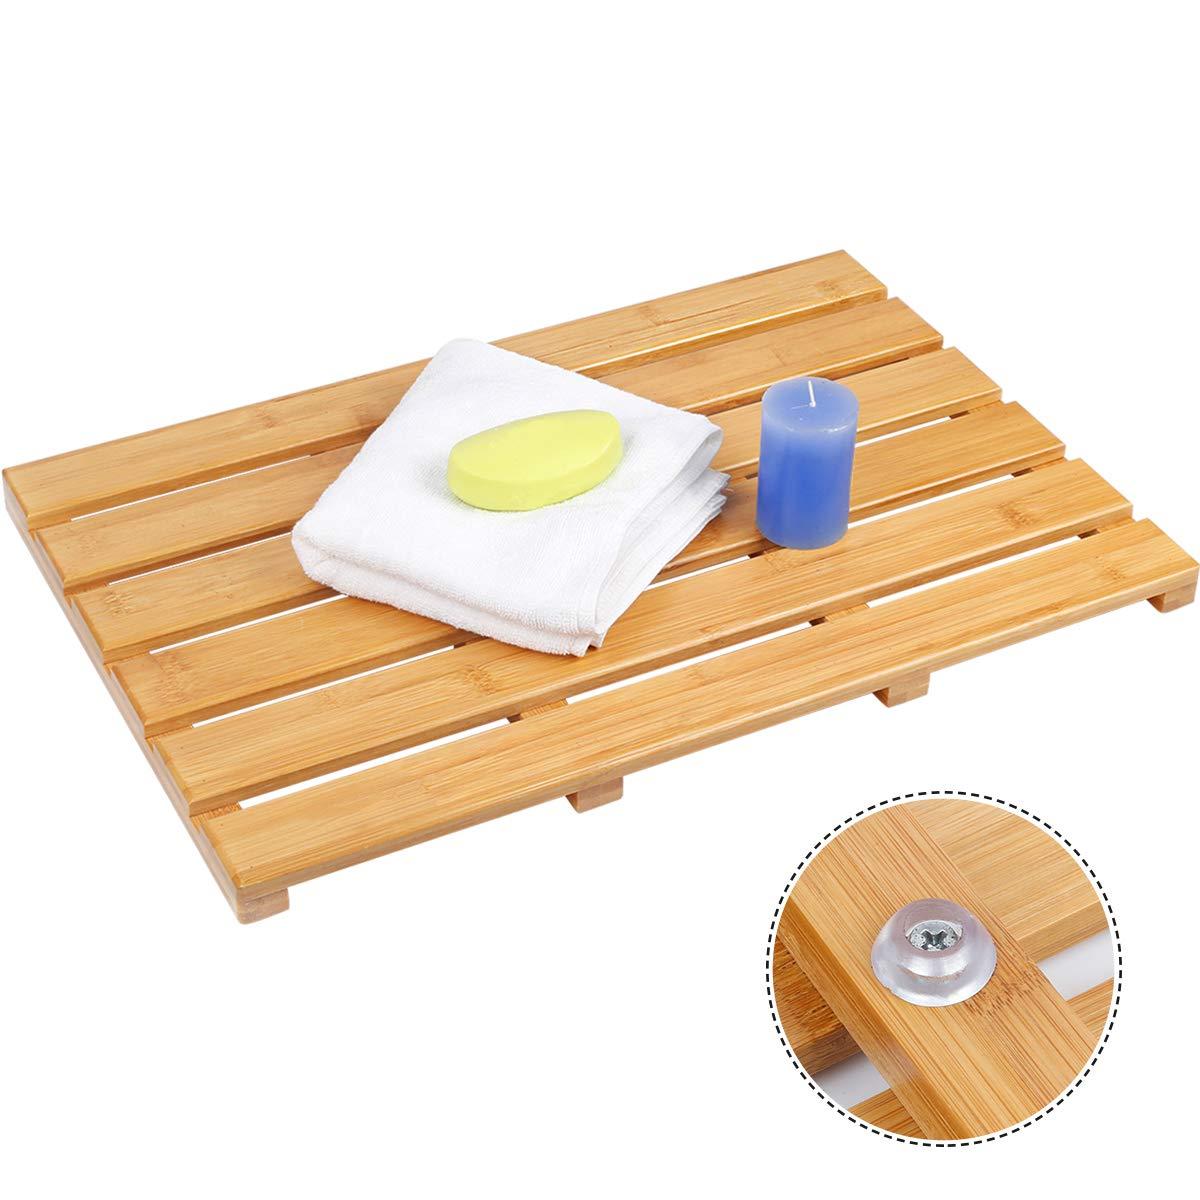 Bamboo Shower Mat Square Bath &Floor Mats Non-sliding Waterproof-by Ecobambu